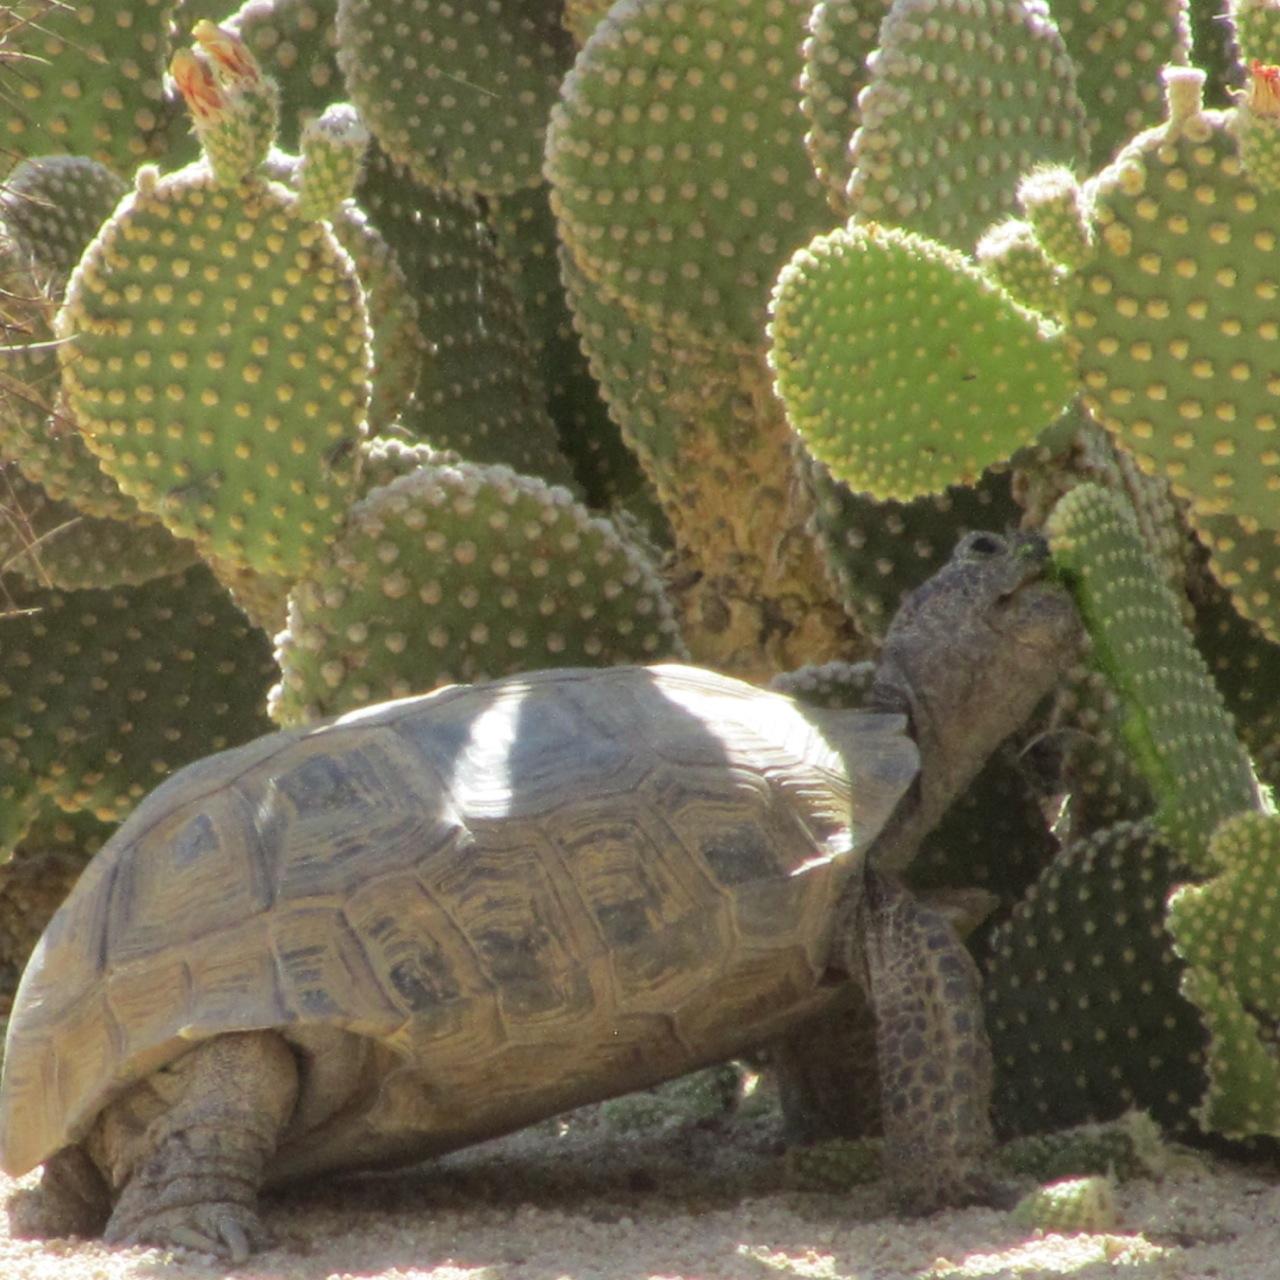 tortoise_eating_cactus_02.jpg